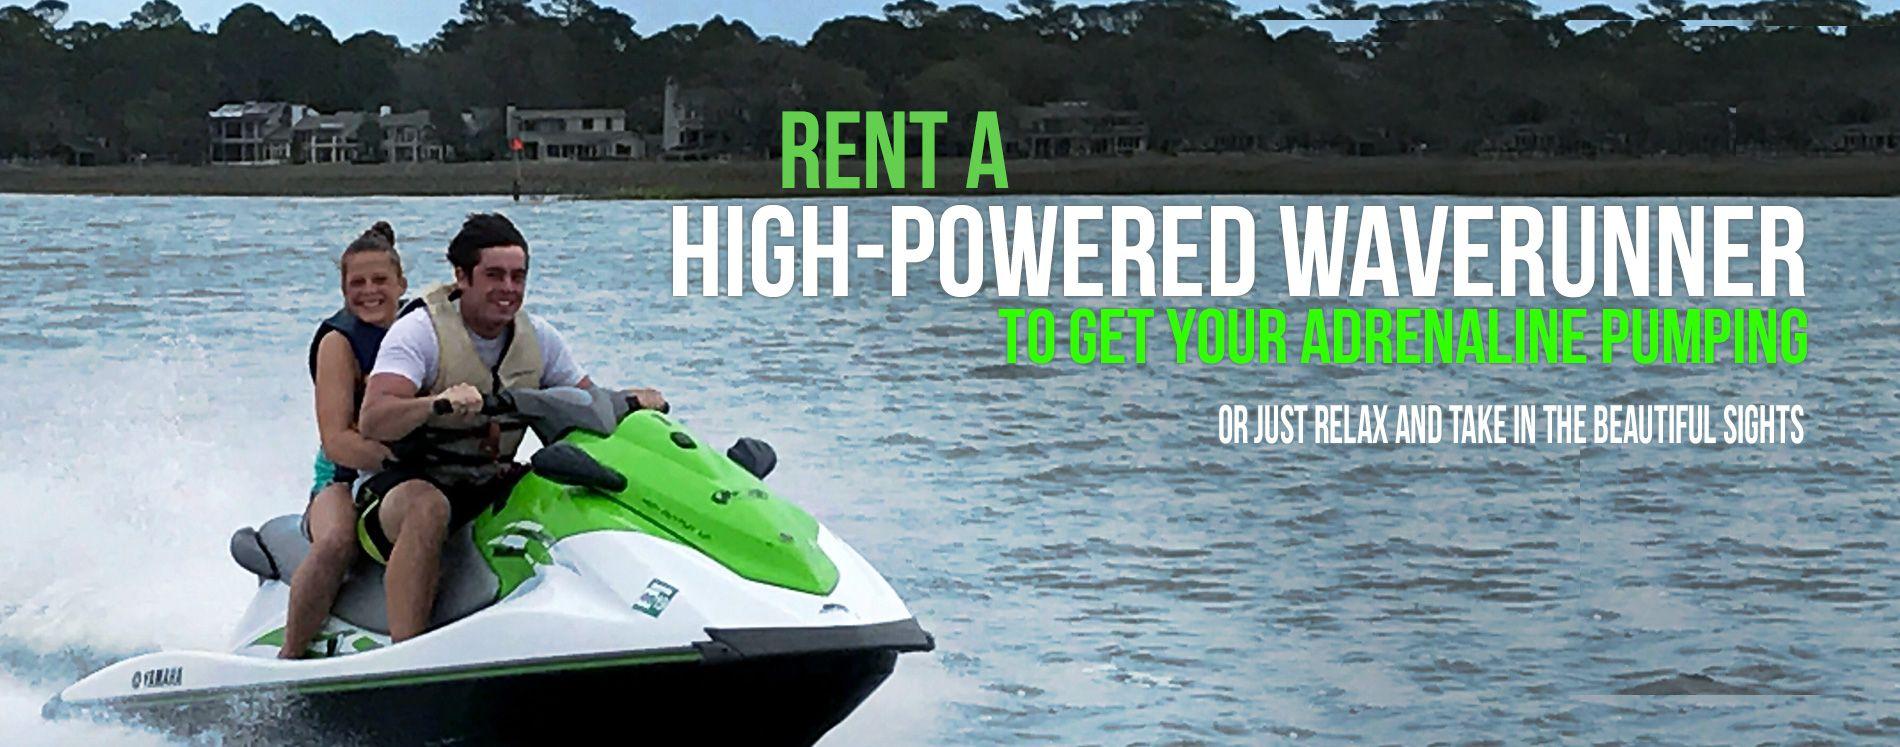 Hilton Head Sailing Hilton head, Jet ski rentals, Waverunner